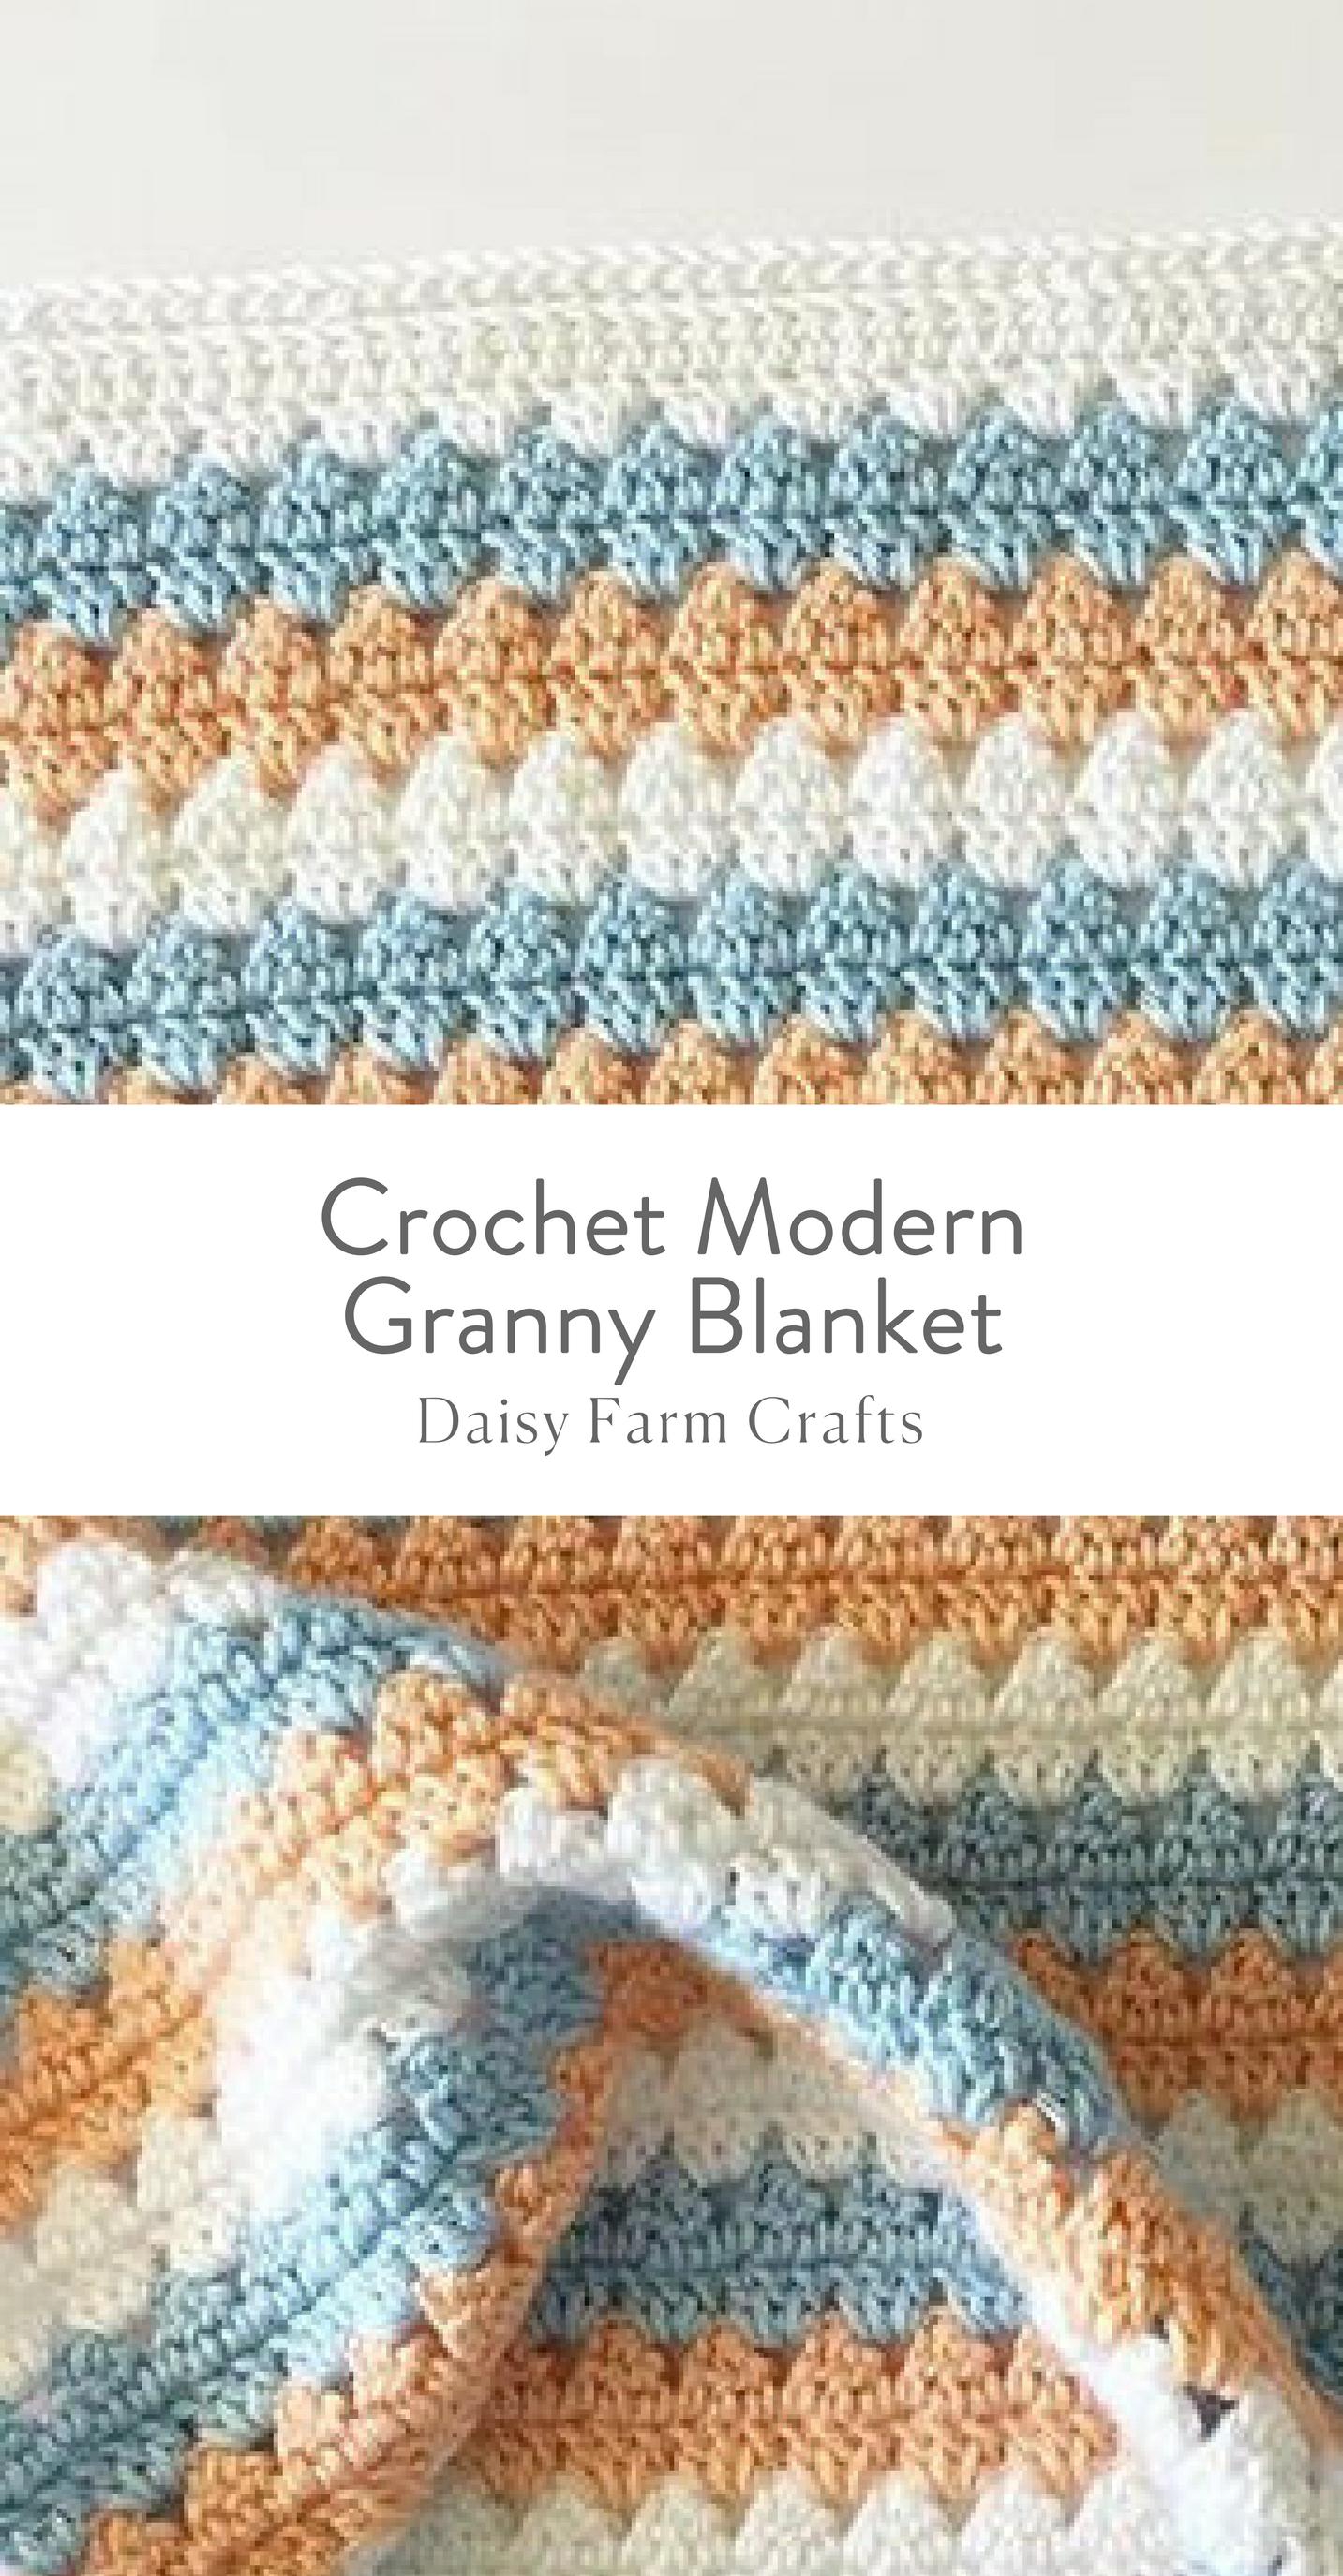 Free Pattern - Crochet Modern Granny Blanket in Peach and Blue ...